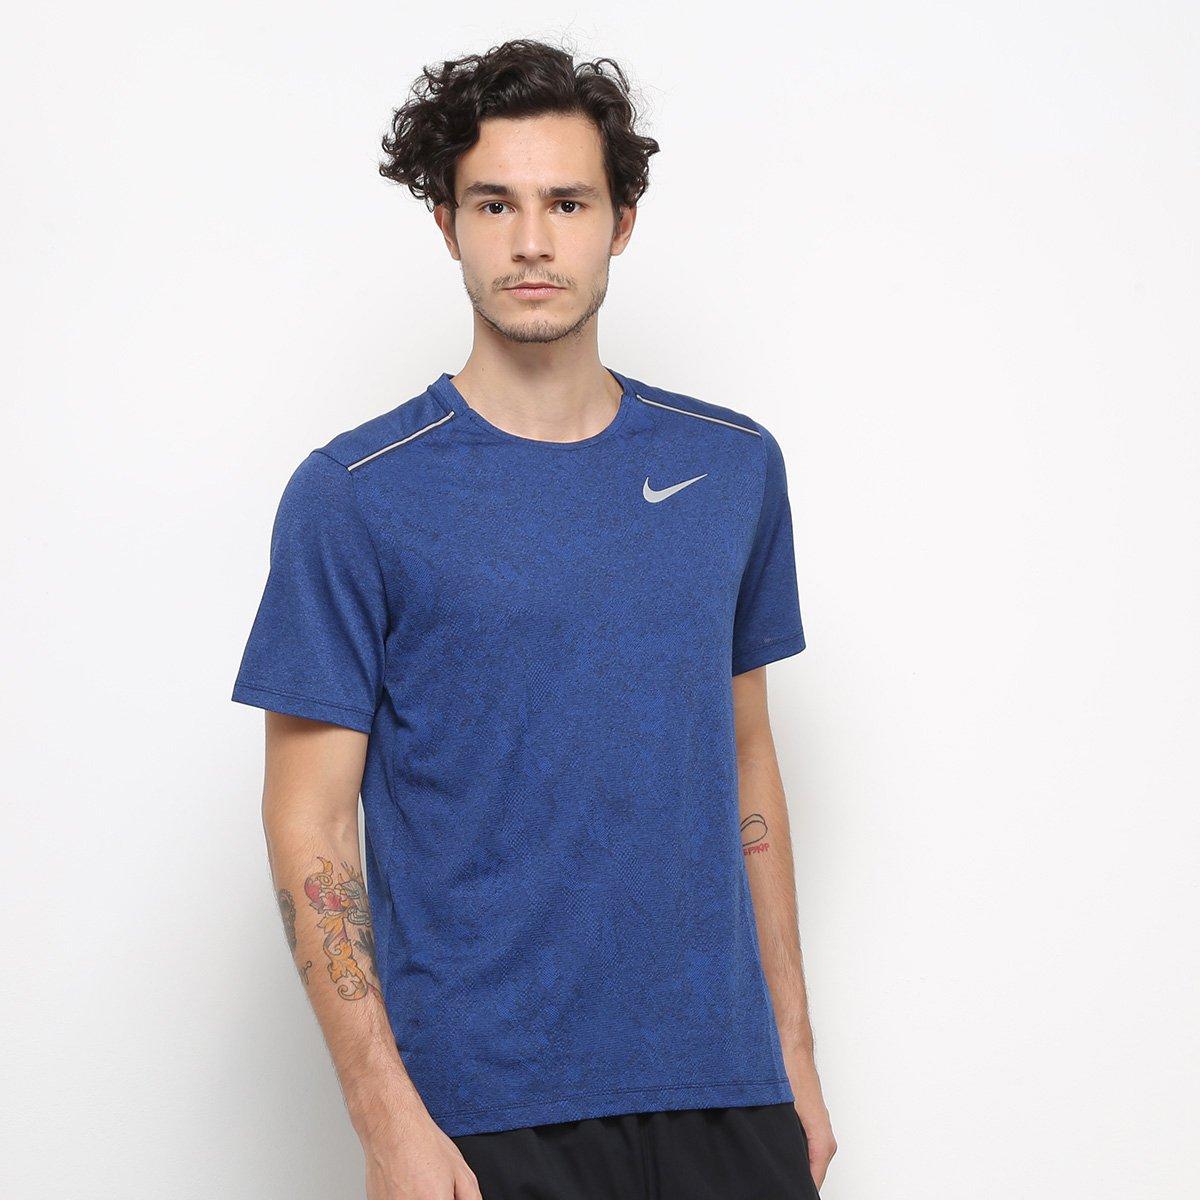 Camiseta Nike DRI-FIT Miler Jac Gx Masculina - Azul Petróleo e Prata